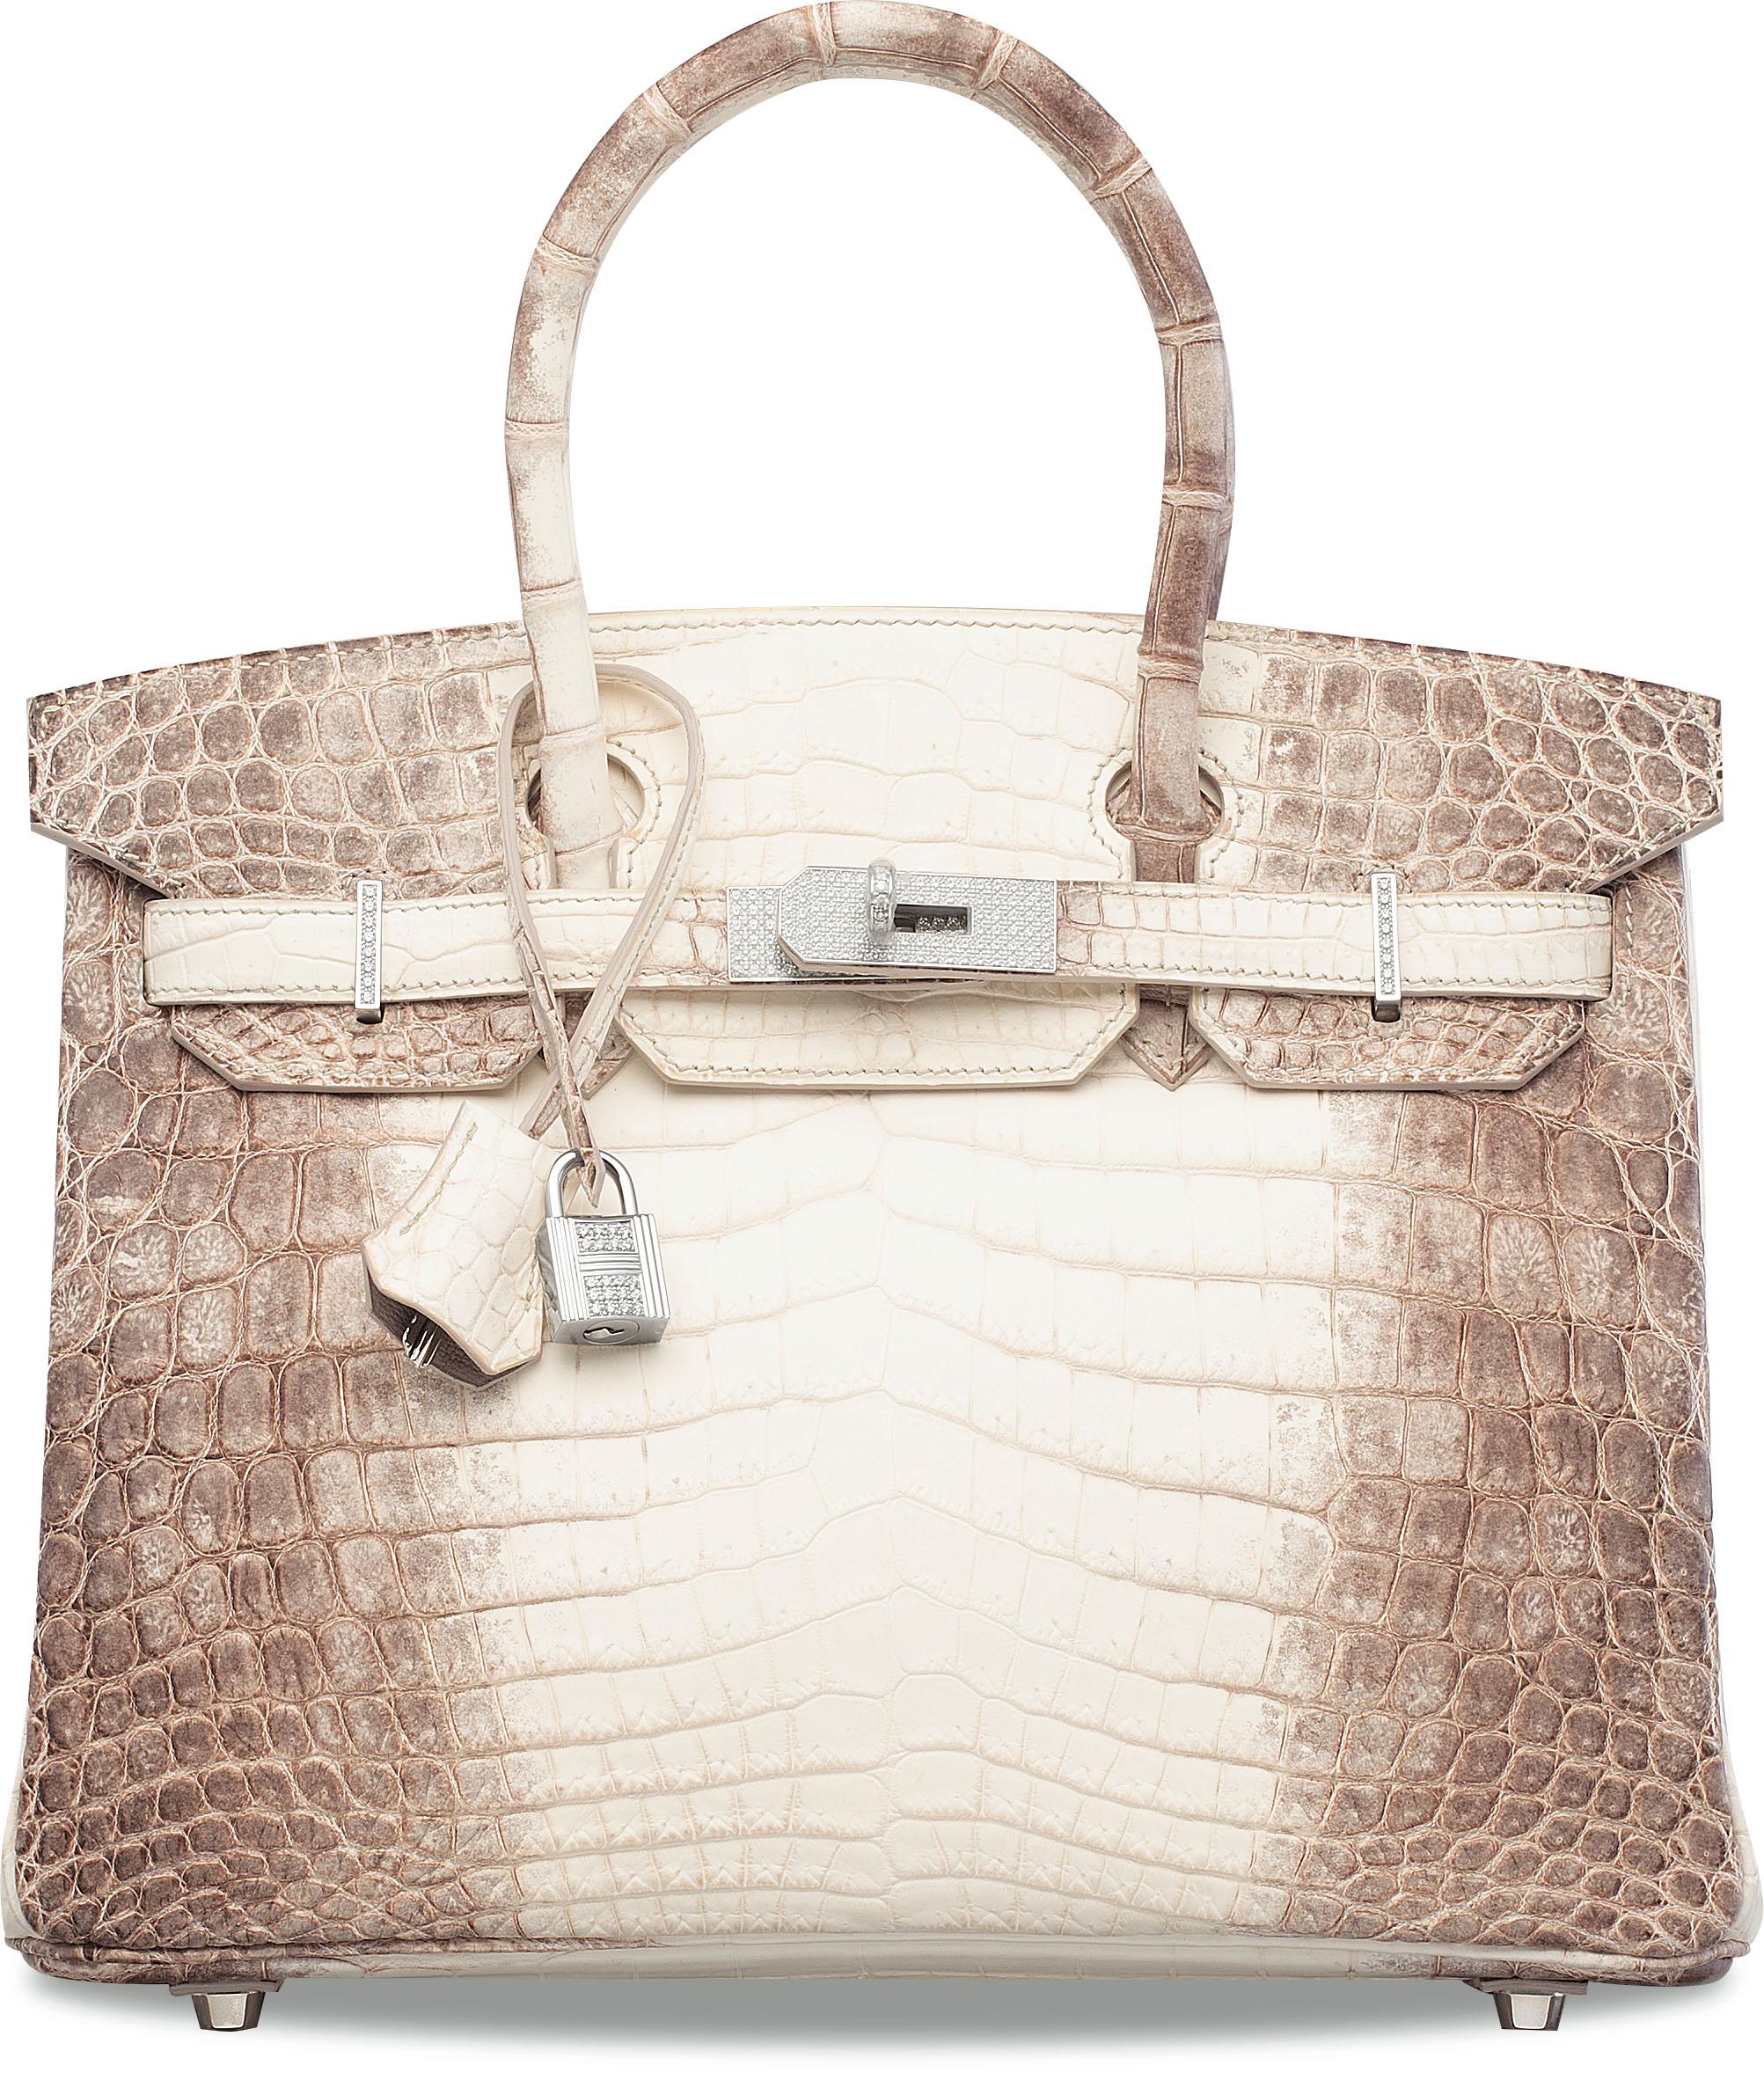 A 2011 Himalaya Niloticus crocodile Hermès Birkin 30 handbag with 18k white gold and diamond hardware. As of November 2019, it holds the world auction record for any handbag.